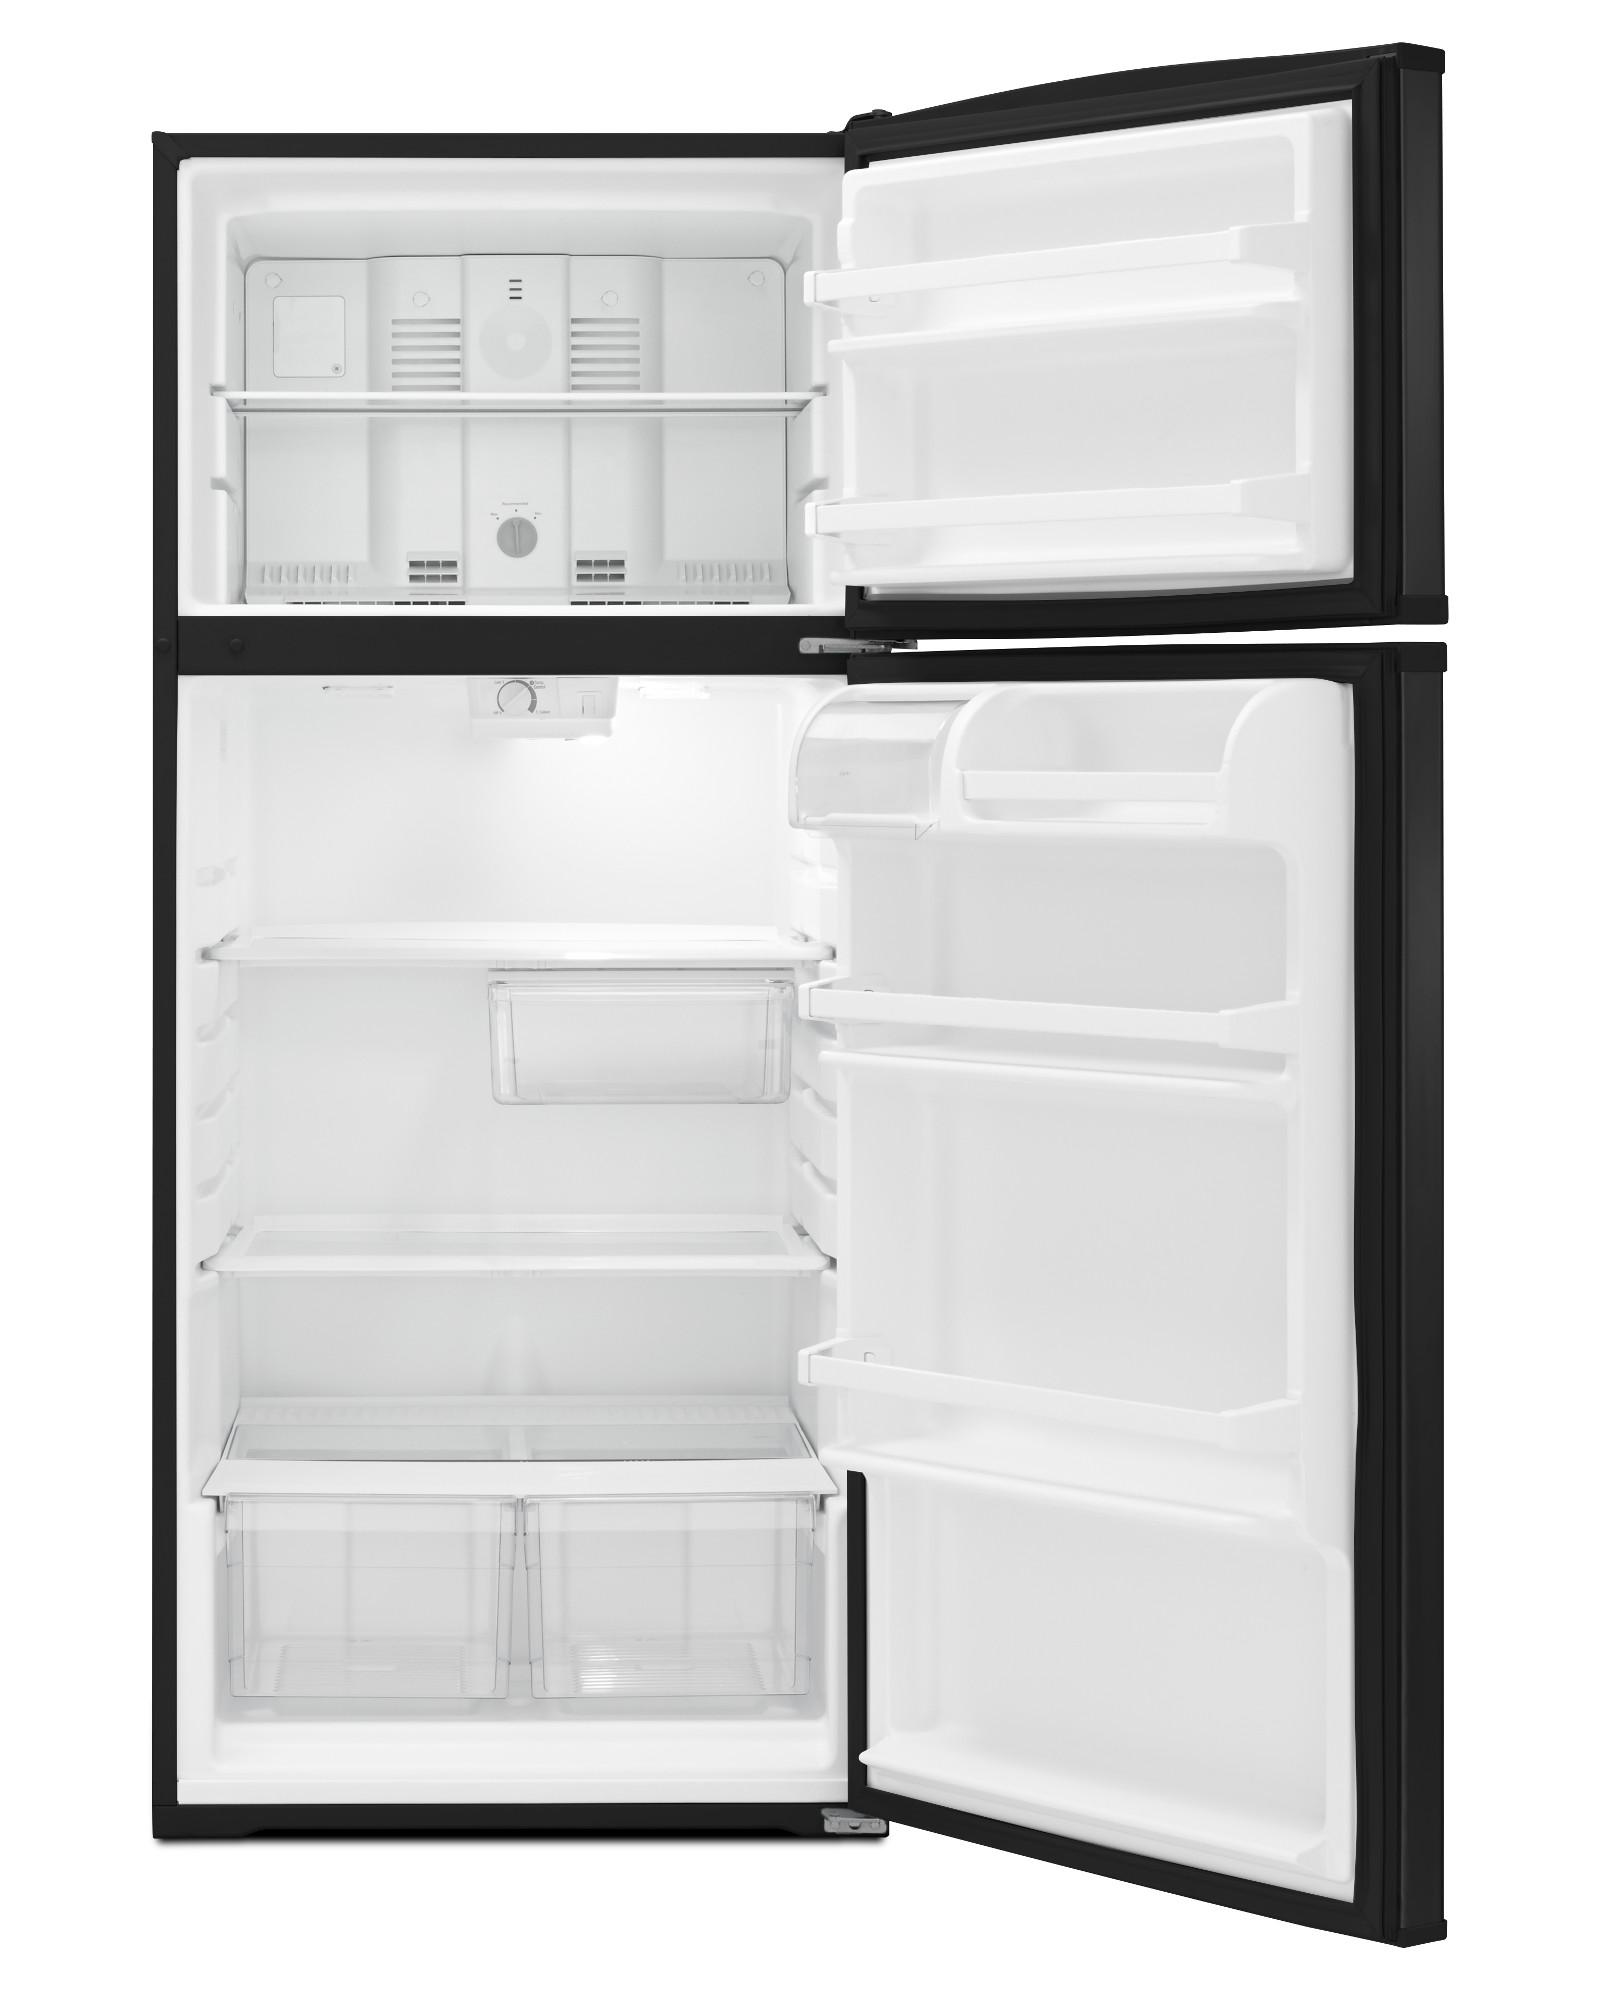 Whirlpool WRT316SFDB 16 cu. ft. Top Freezer Refrigerator - Black